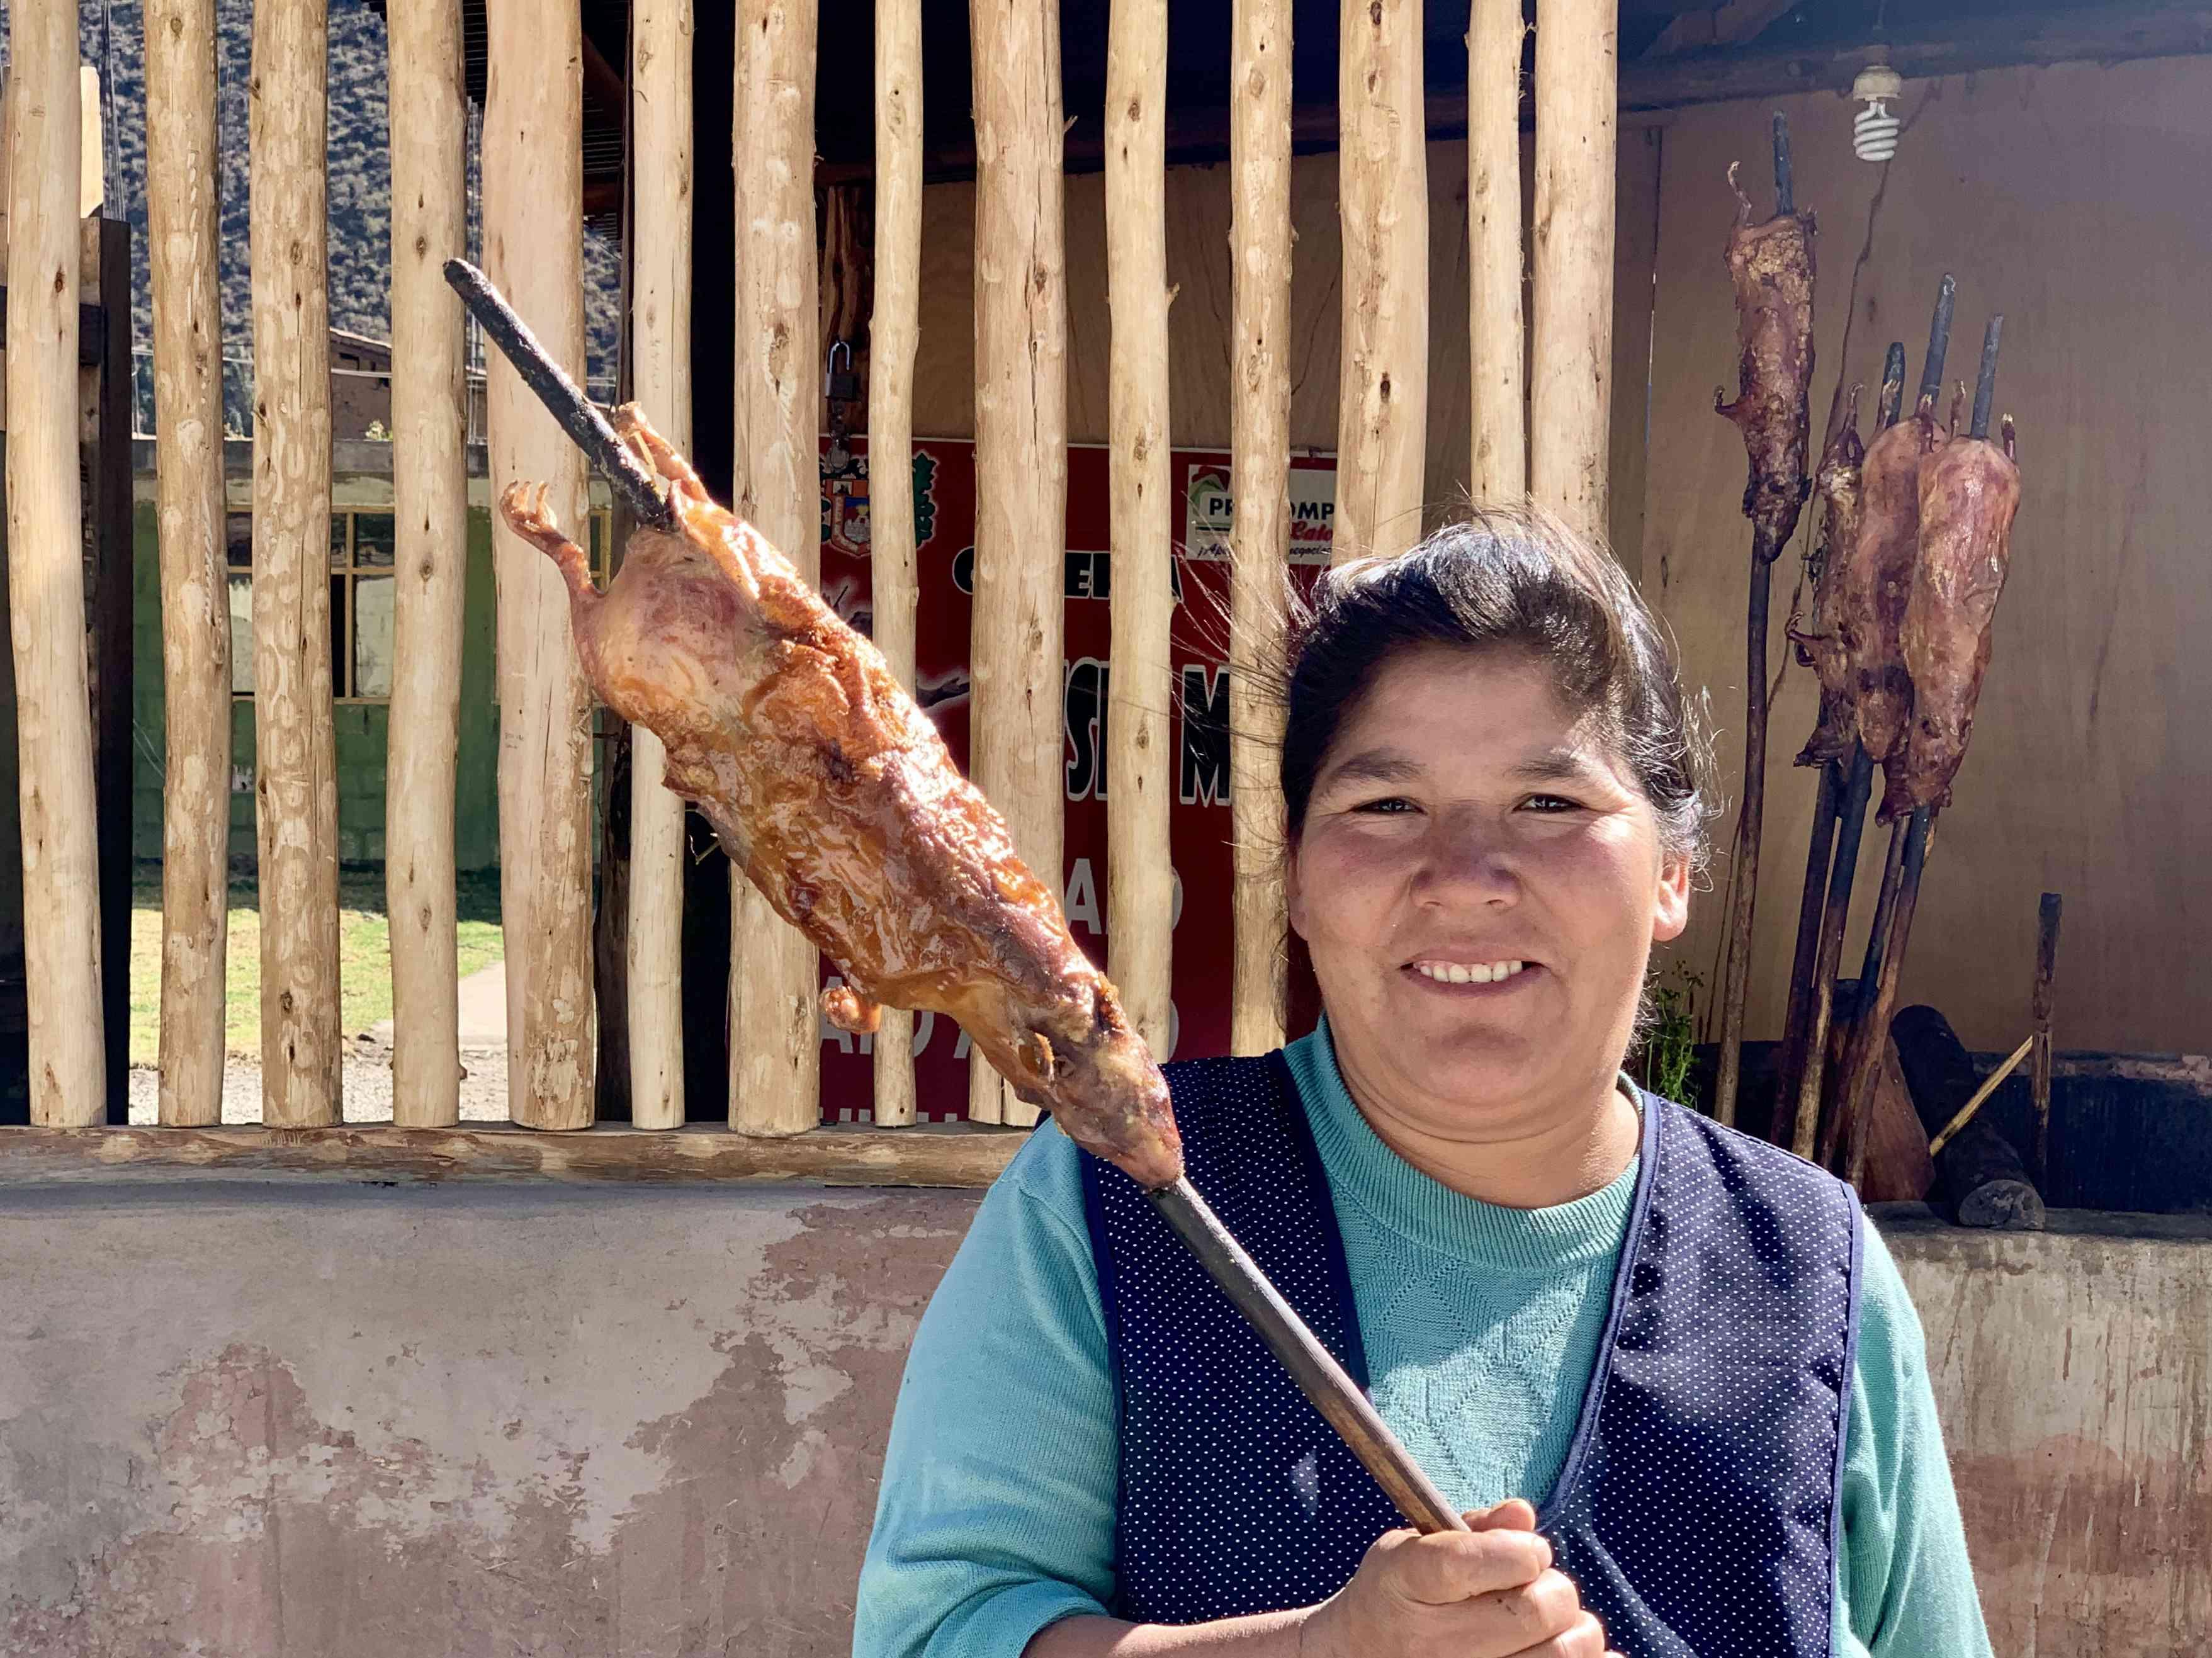 Cuy, a Peruvian delicacy